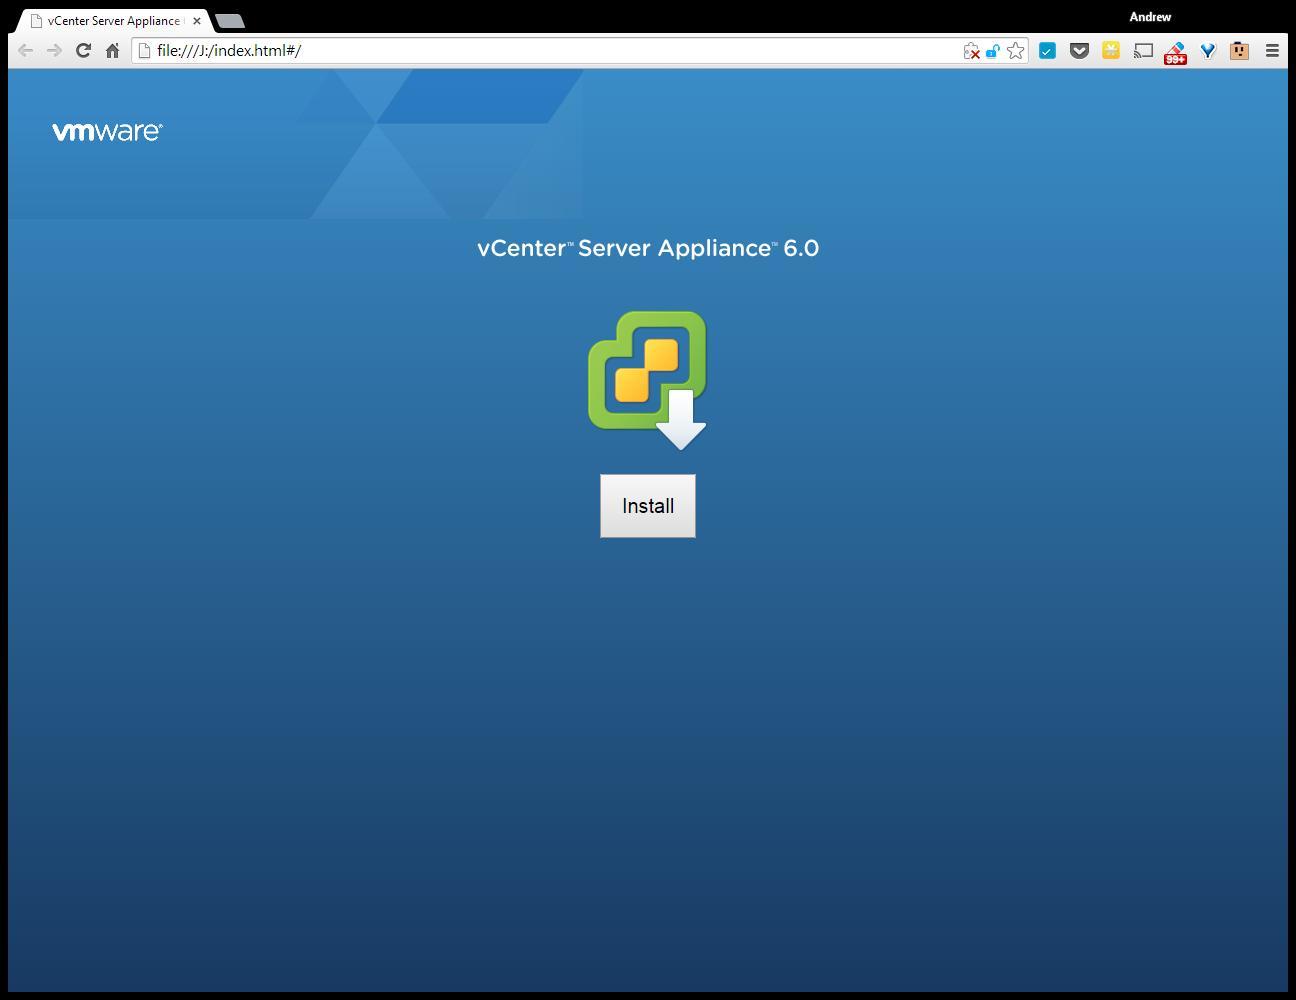 vmware vcsa all 6.0 0 download free